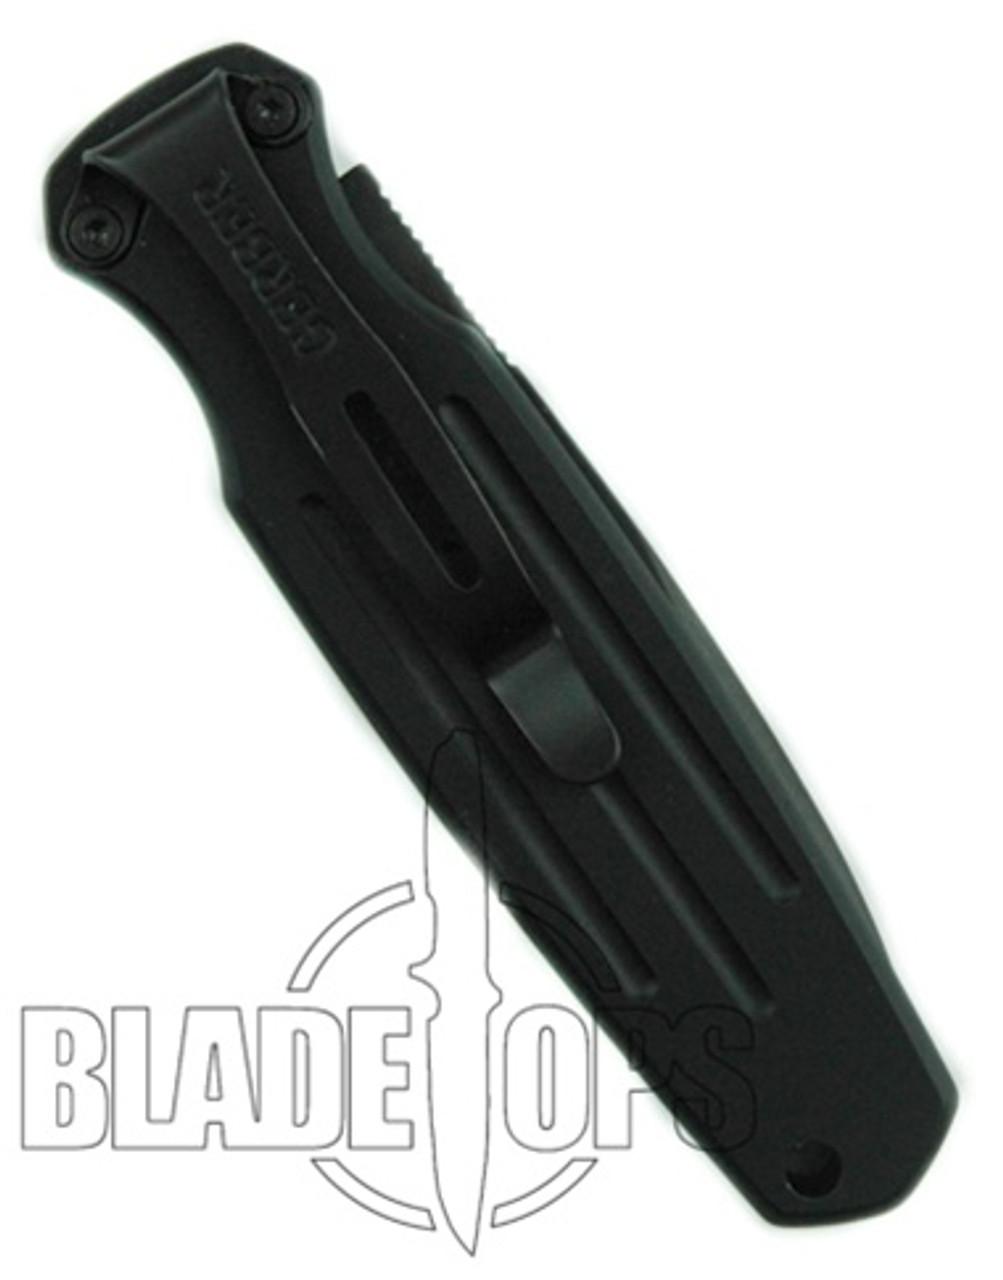 Gerber 30-000244 Mini Covert Auto Knife, CPM-S30V Black Combo Blade